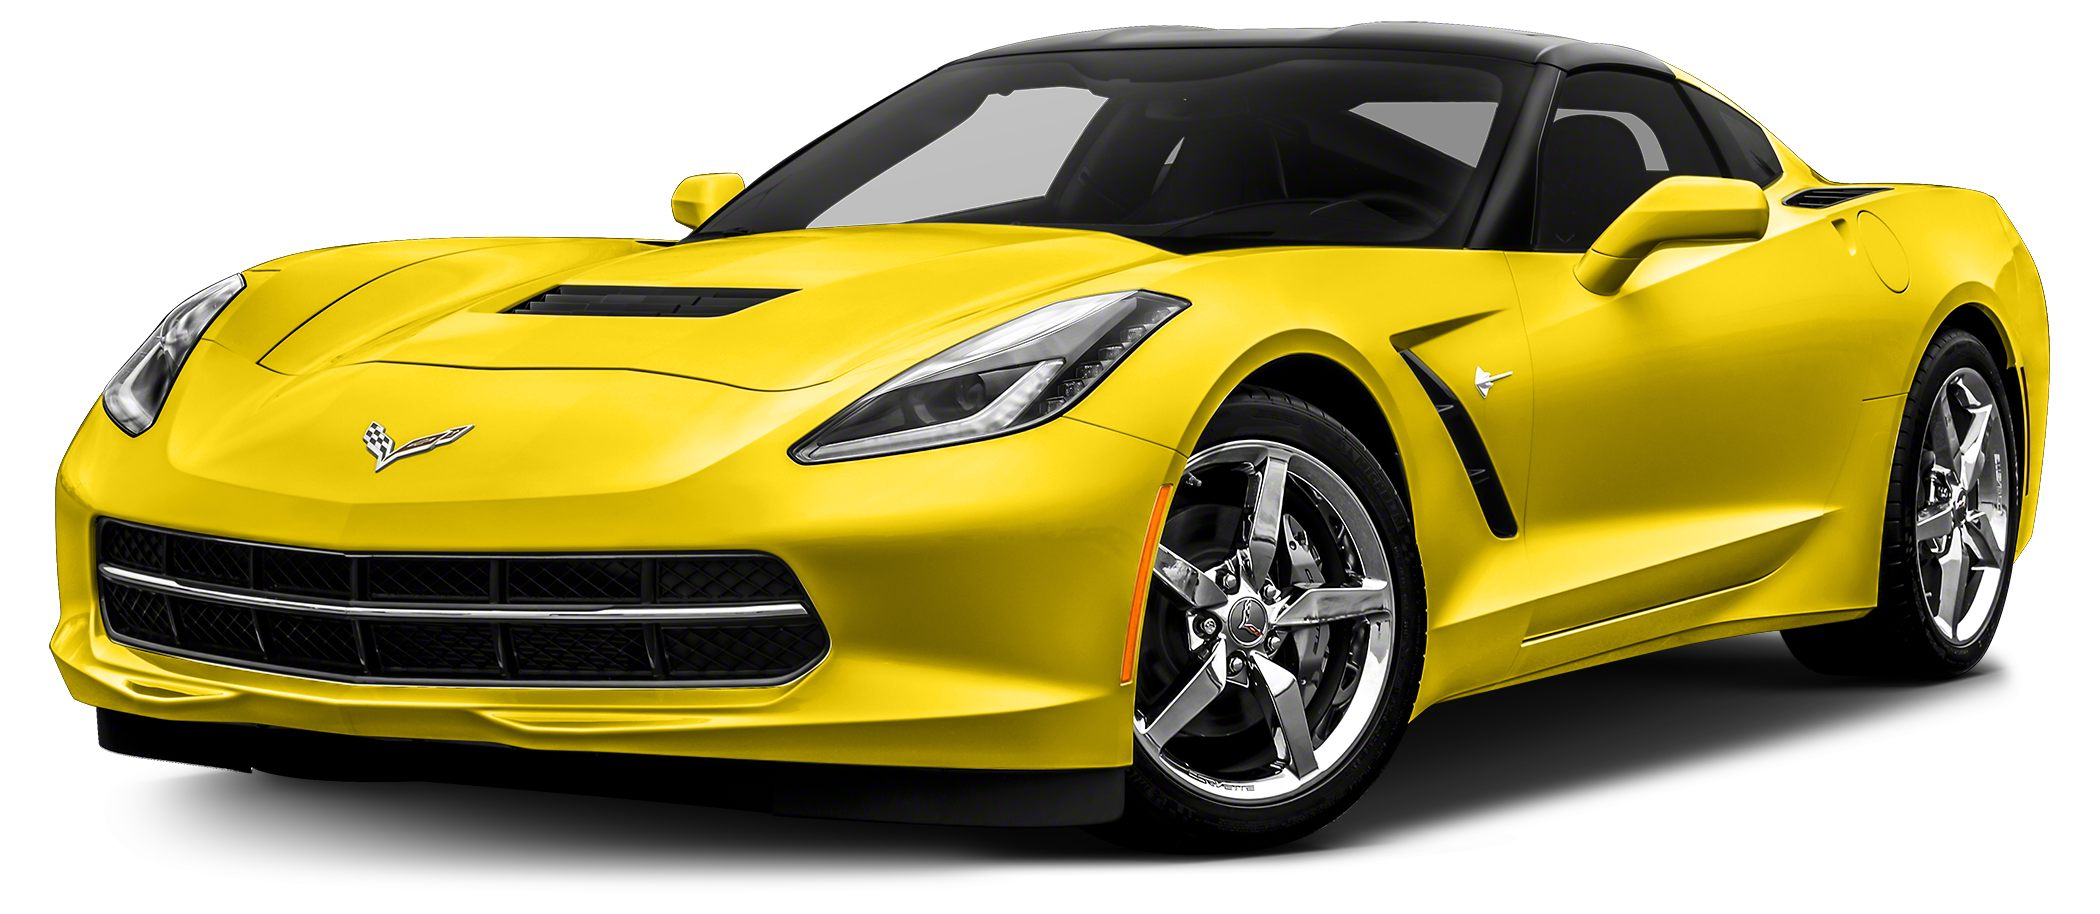 2016 Chevrolet Corvette Stingray what a stud Miles 0Color Racing Yellow Stock 121819 VIN 1